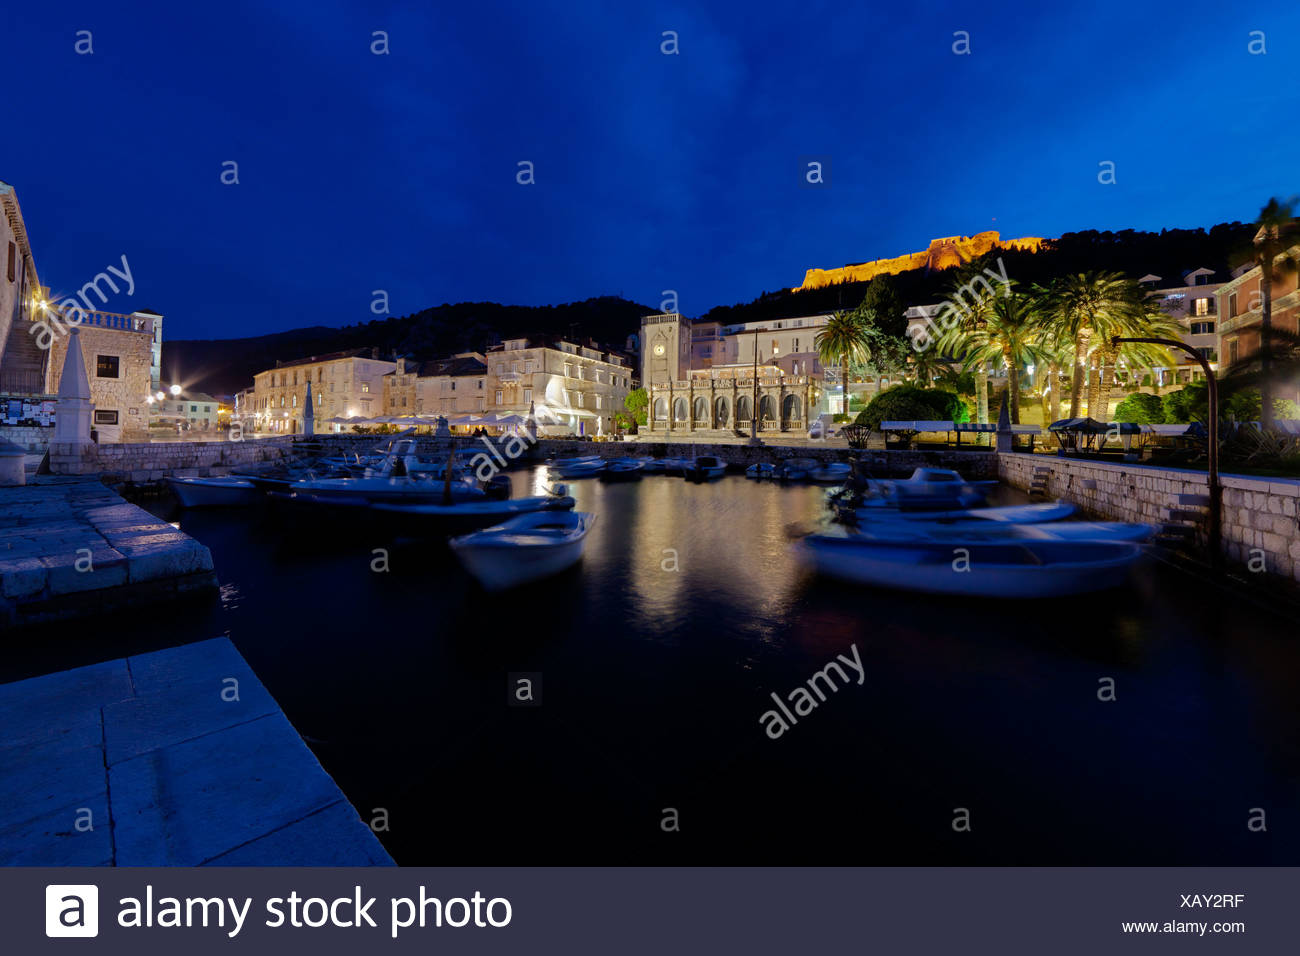 Harbour promenade at Trg Svetog Stjepana, St. Stephen's square, Hvar, Hvar Island, central Dalmatia, Dalmatia, Adriatic coast - Stock Image